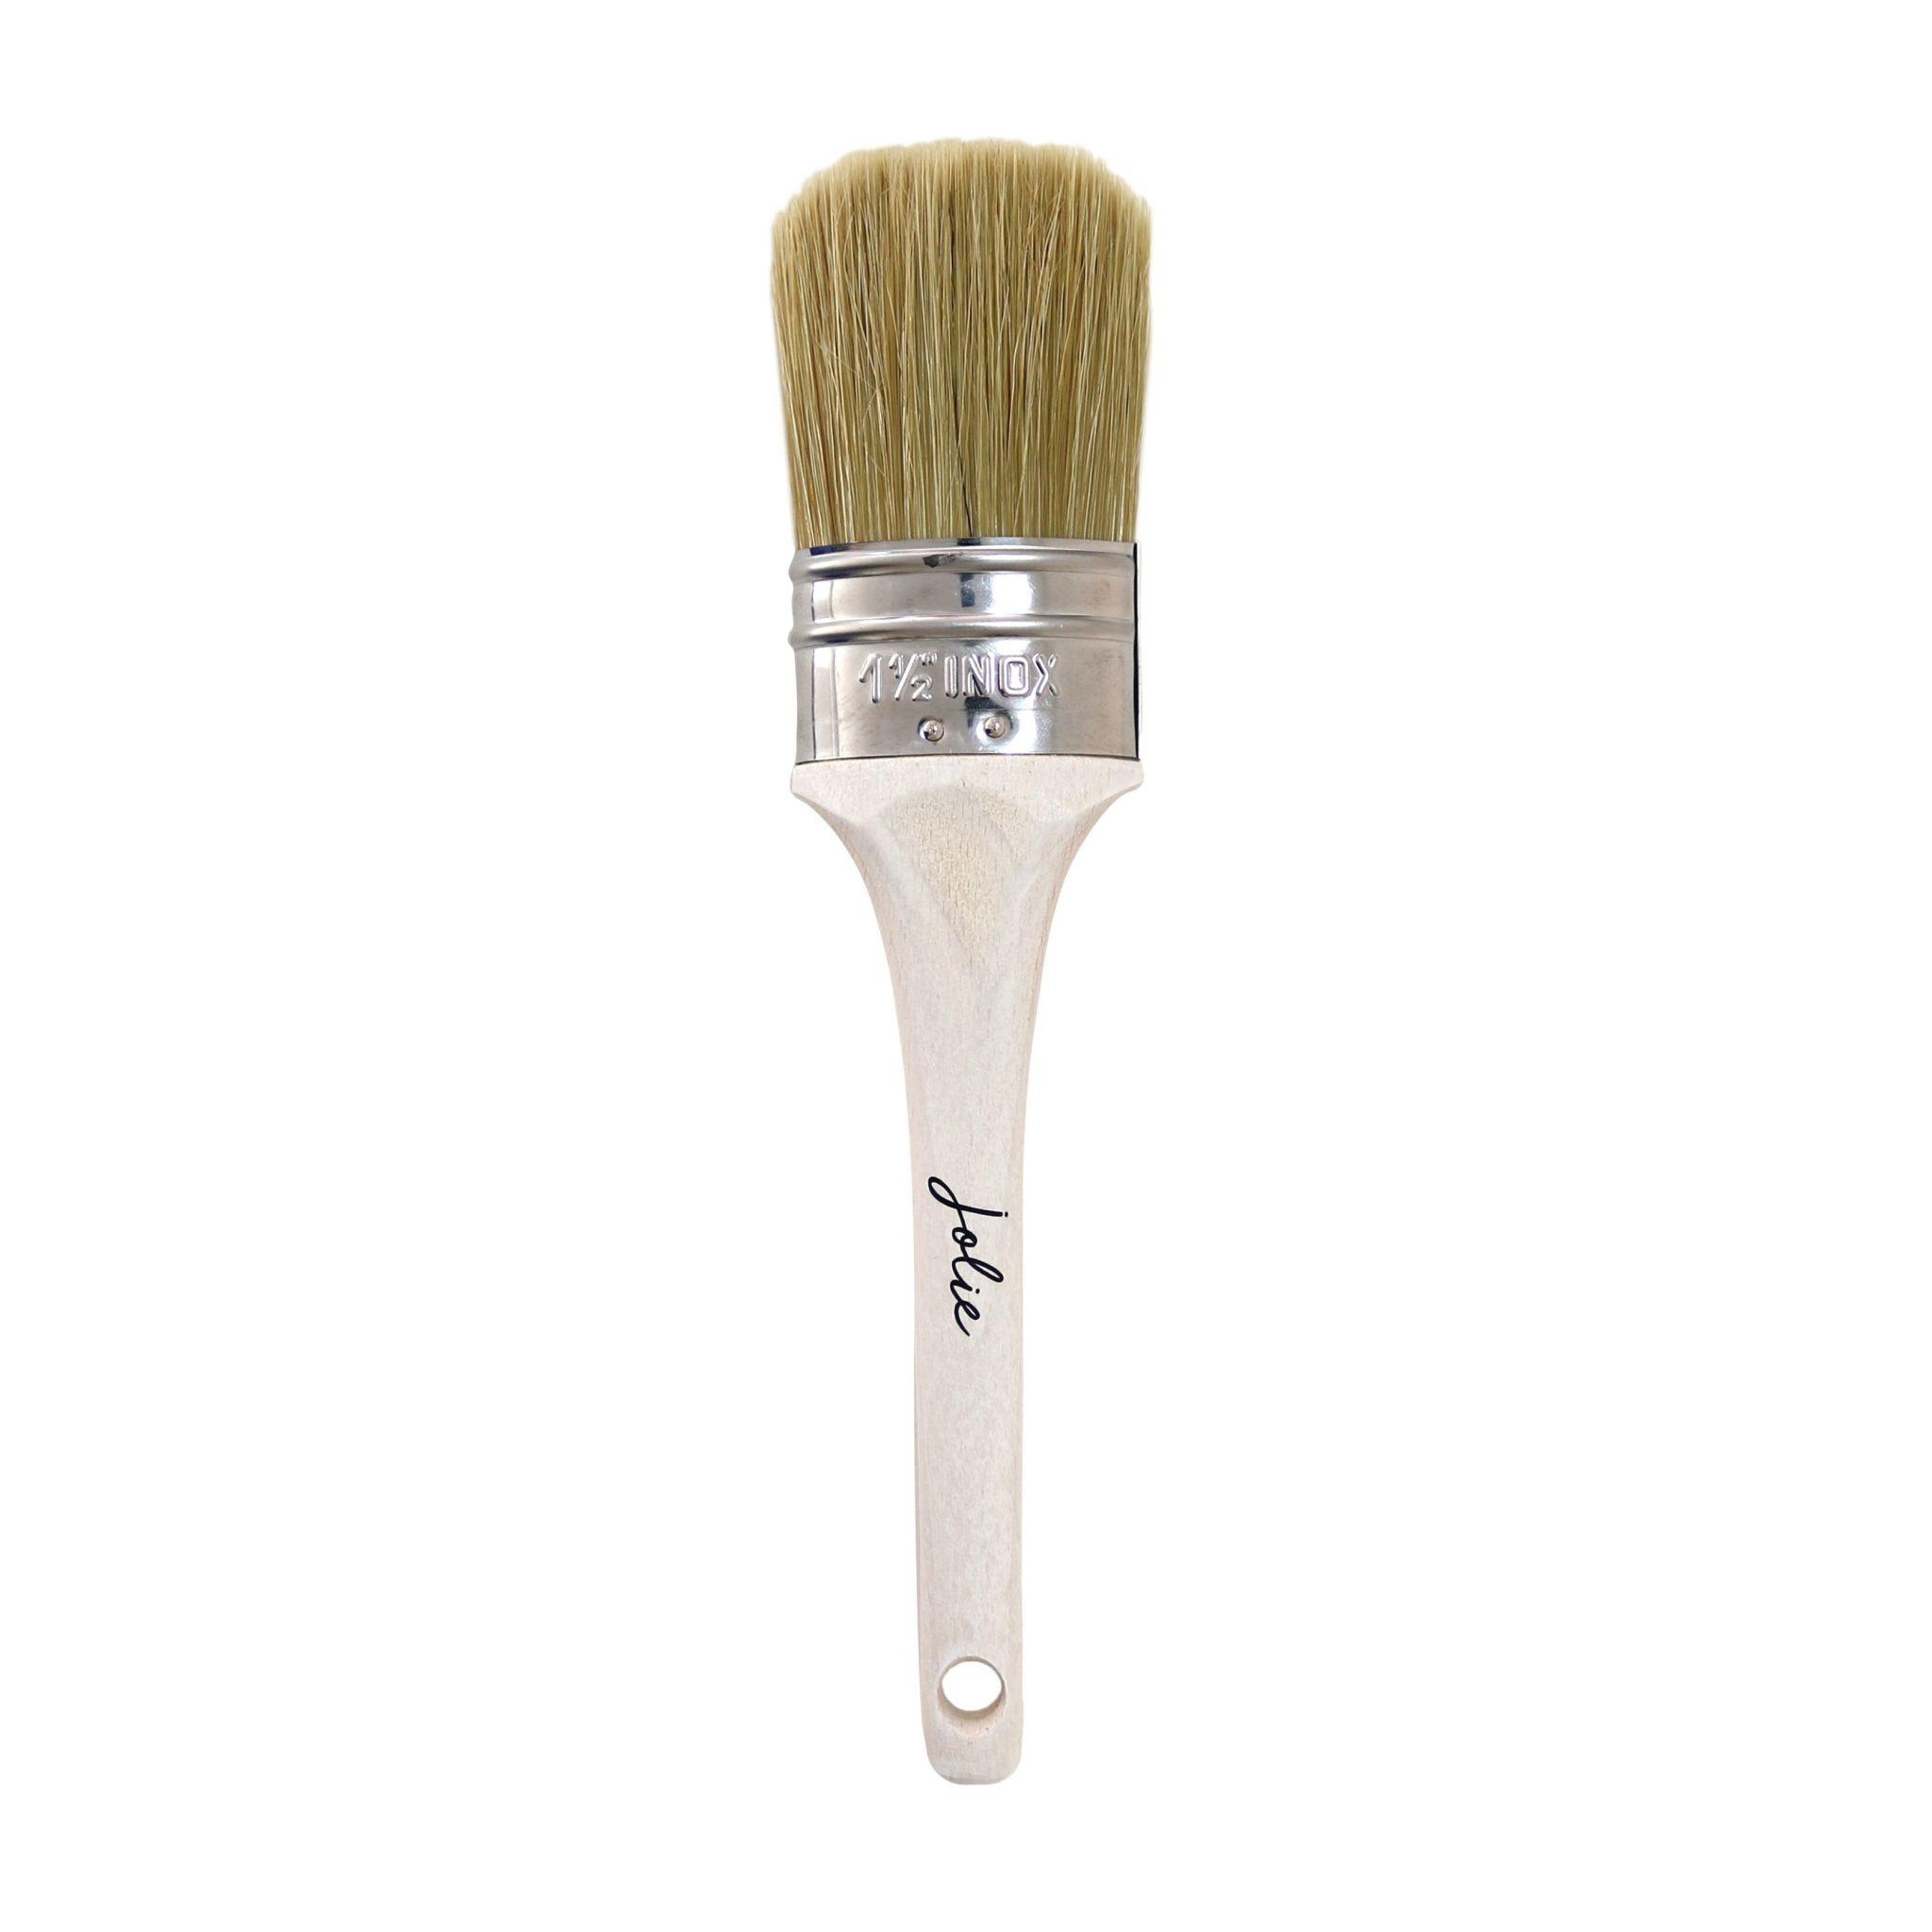 Jolie Home Signature Paint Brush